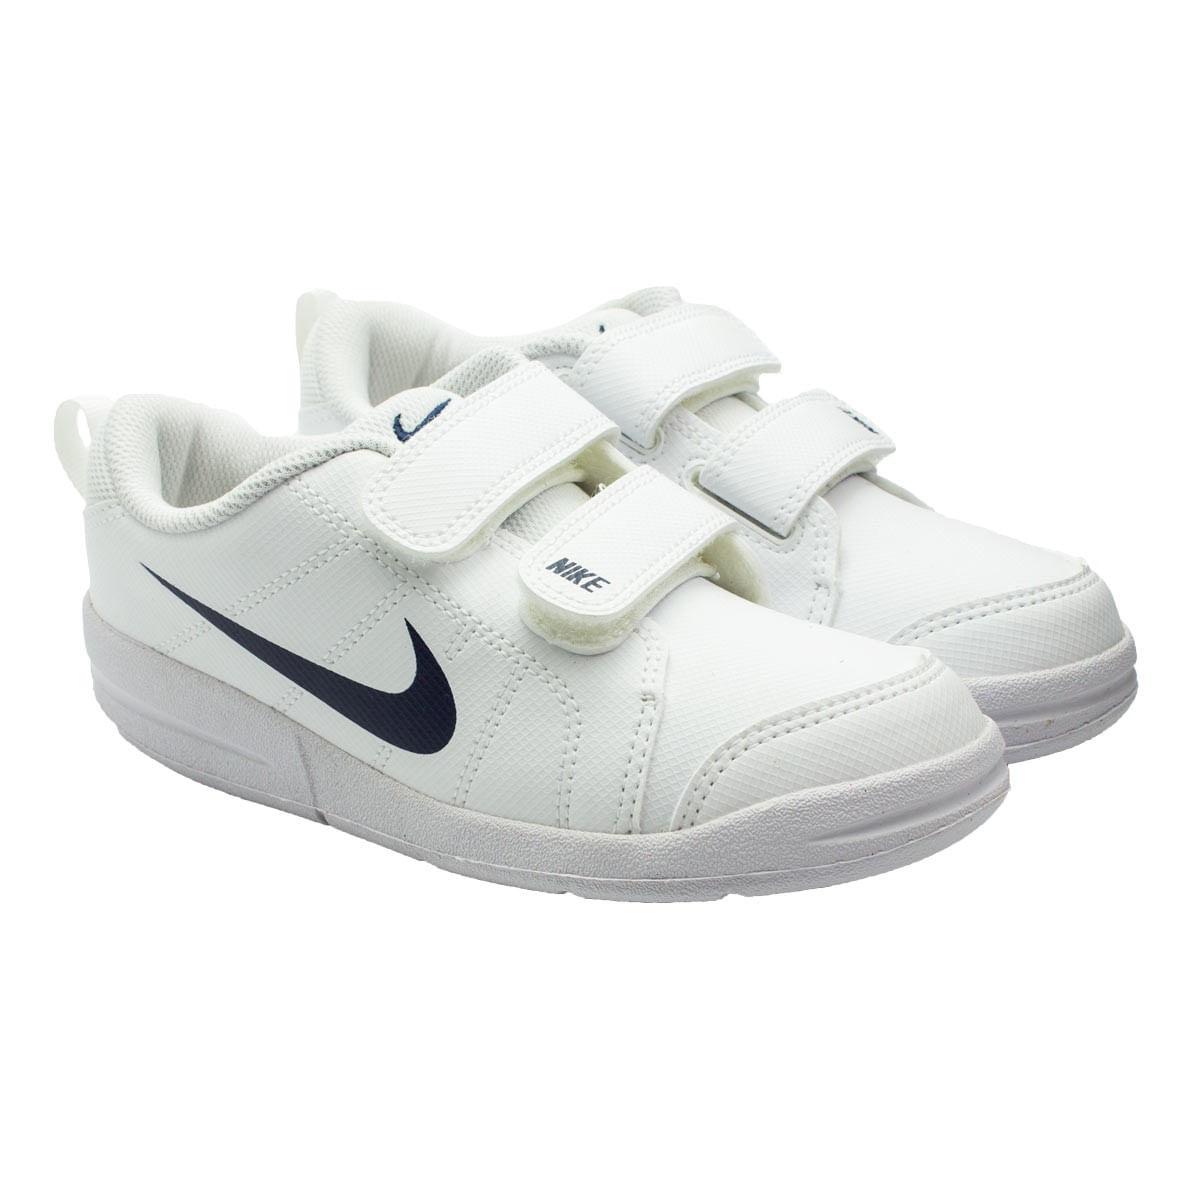 Tenis-Infantil-Nike-Pico-LT-PSV--27-ao-33-